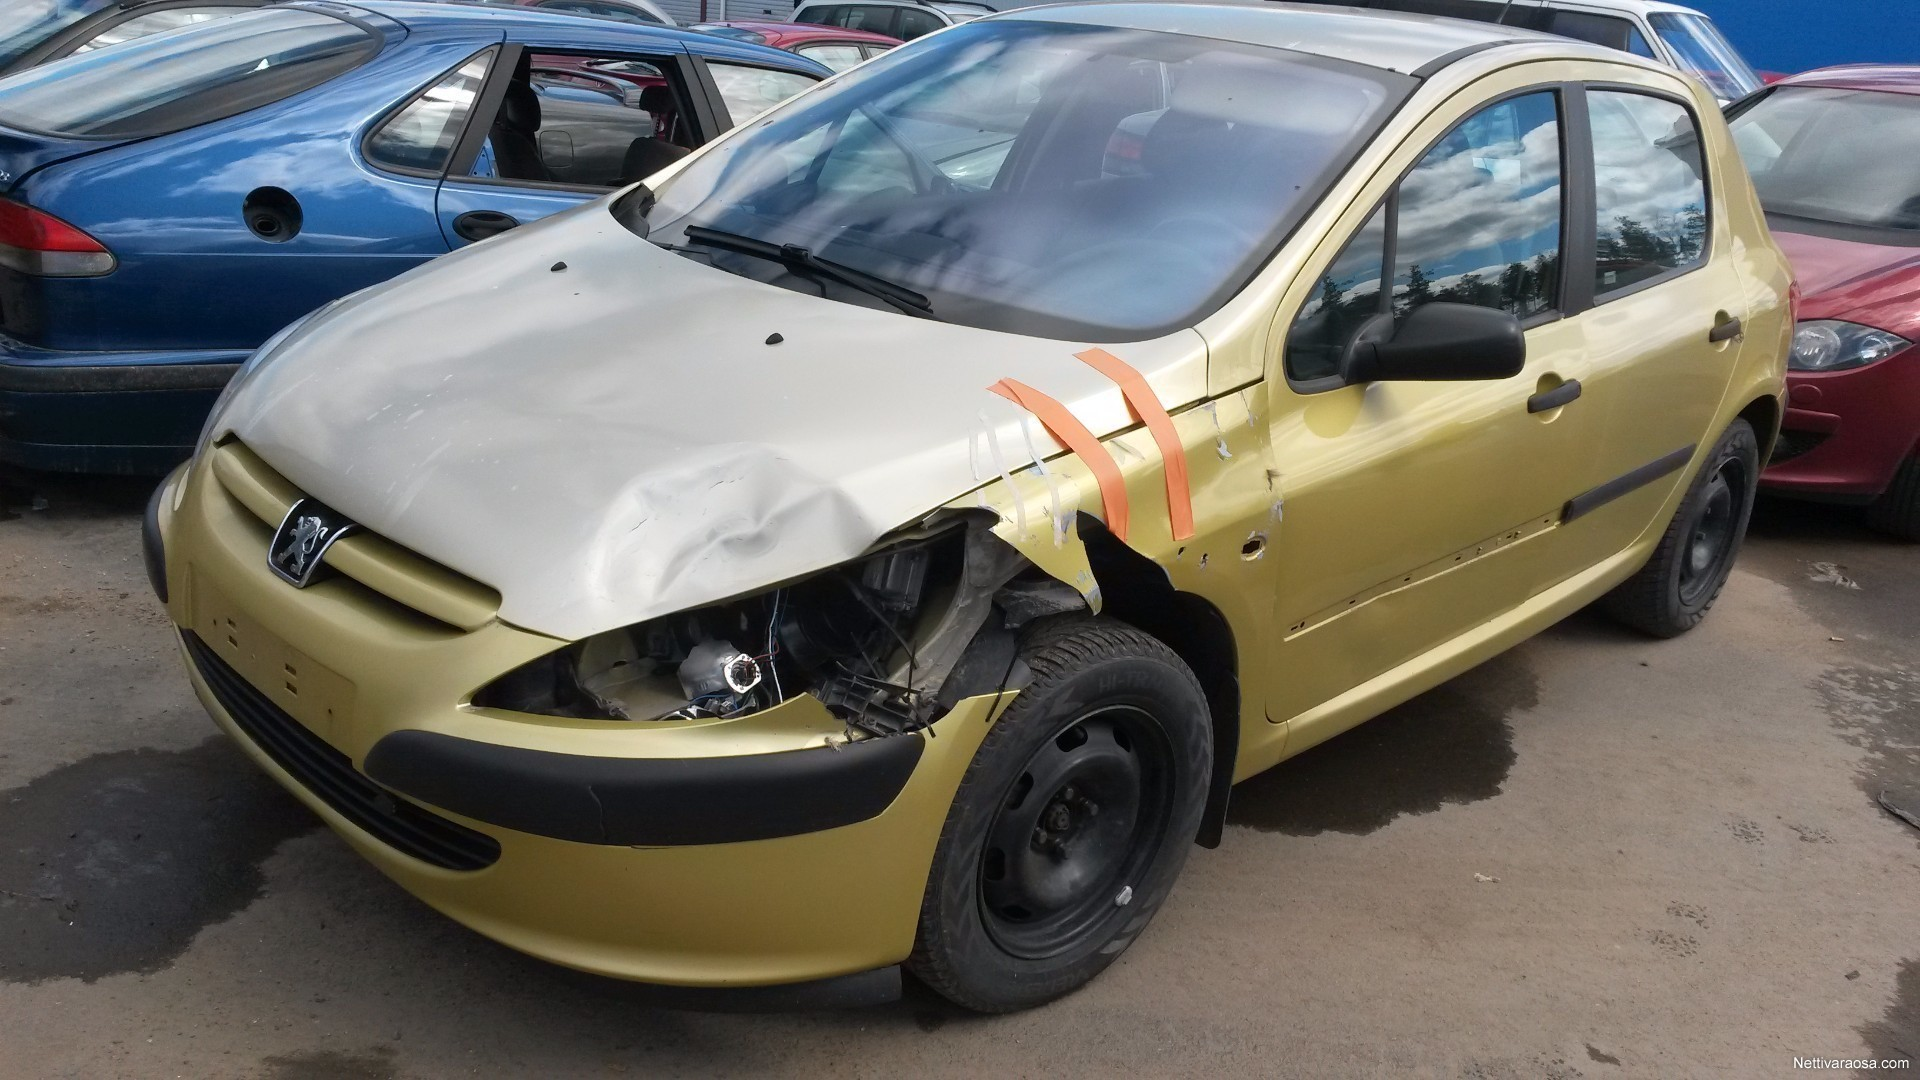 Nettivaraosa - Peugeot 307 2001 - 1.6 - Car spare parts - Nettivaraosa